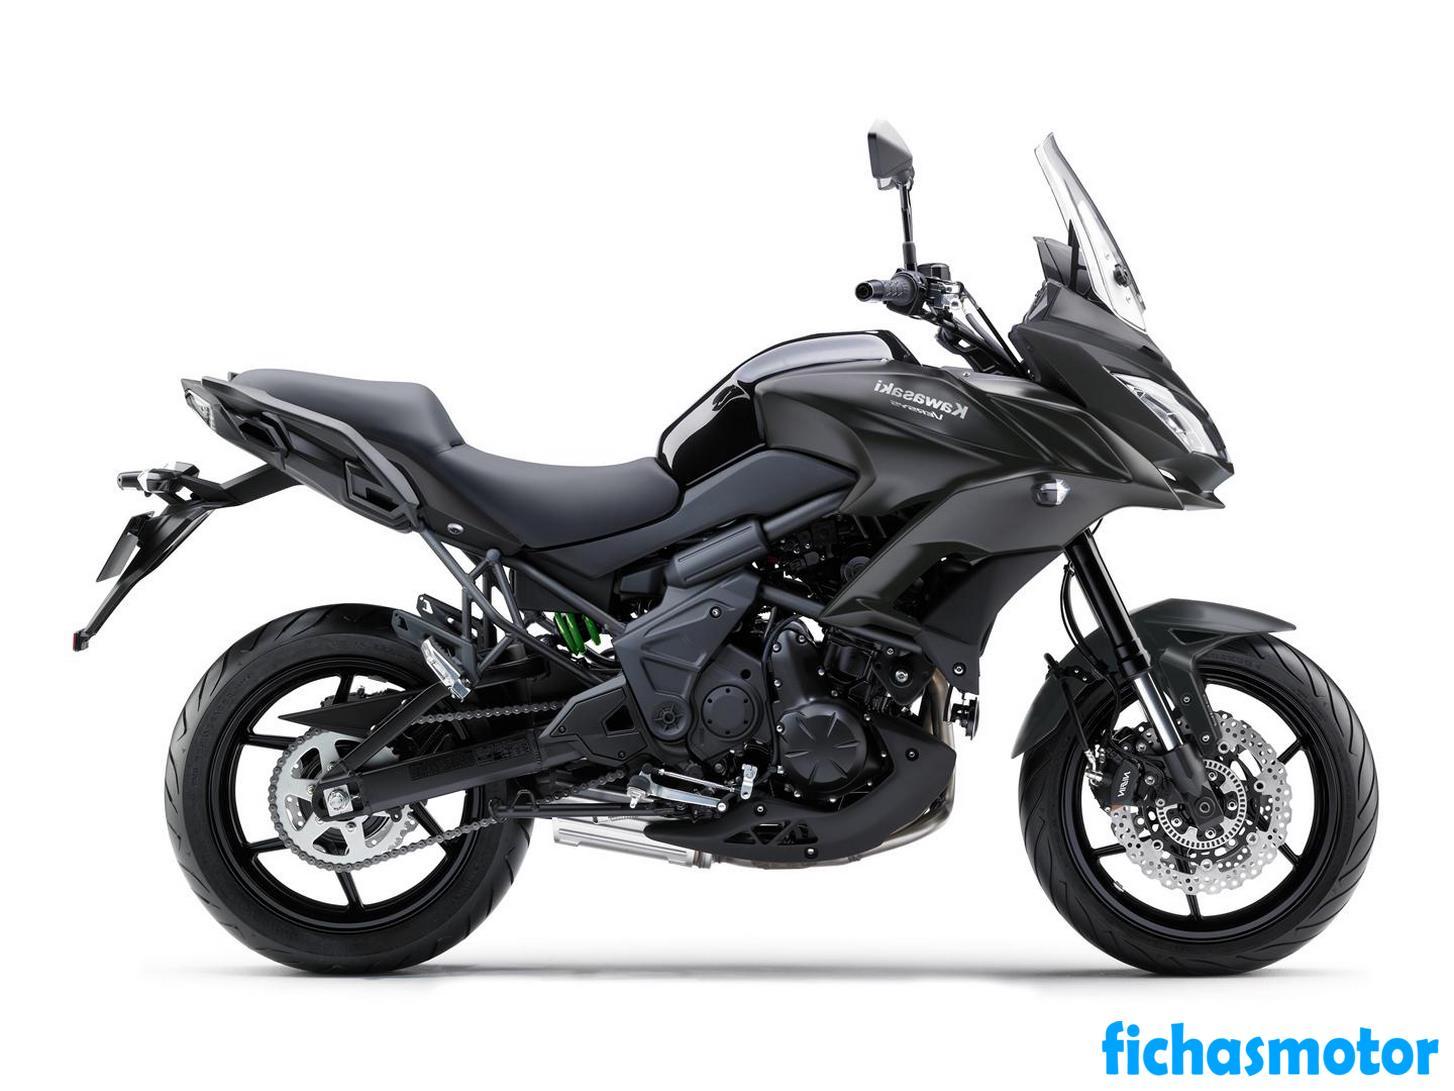 Imagen moto Kawasaki Versys 650 año 2020